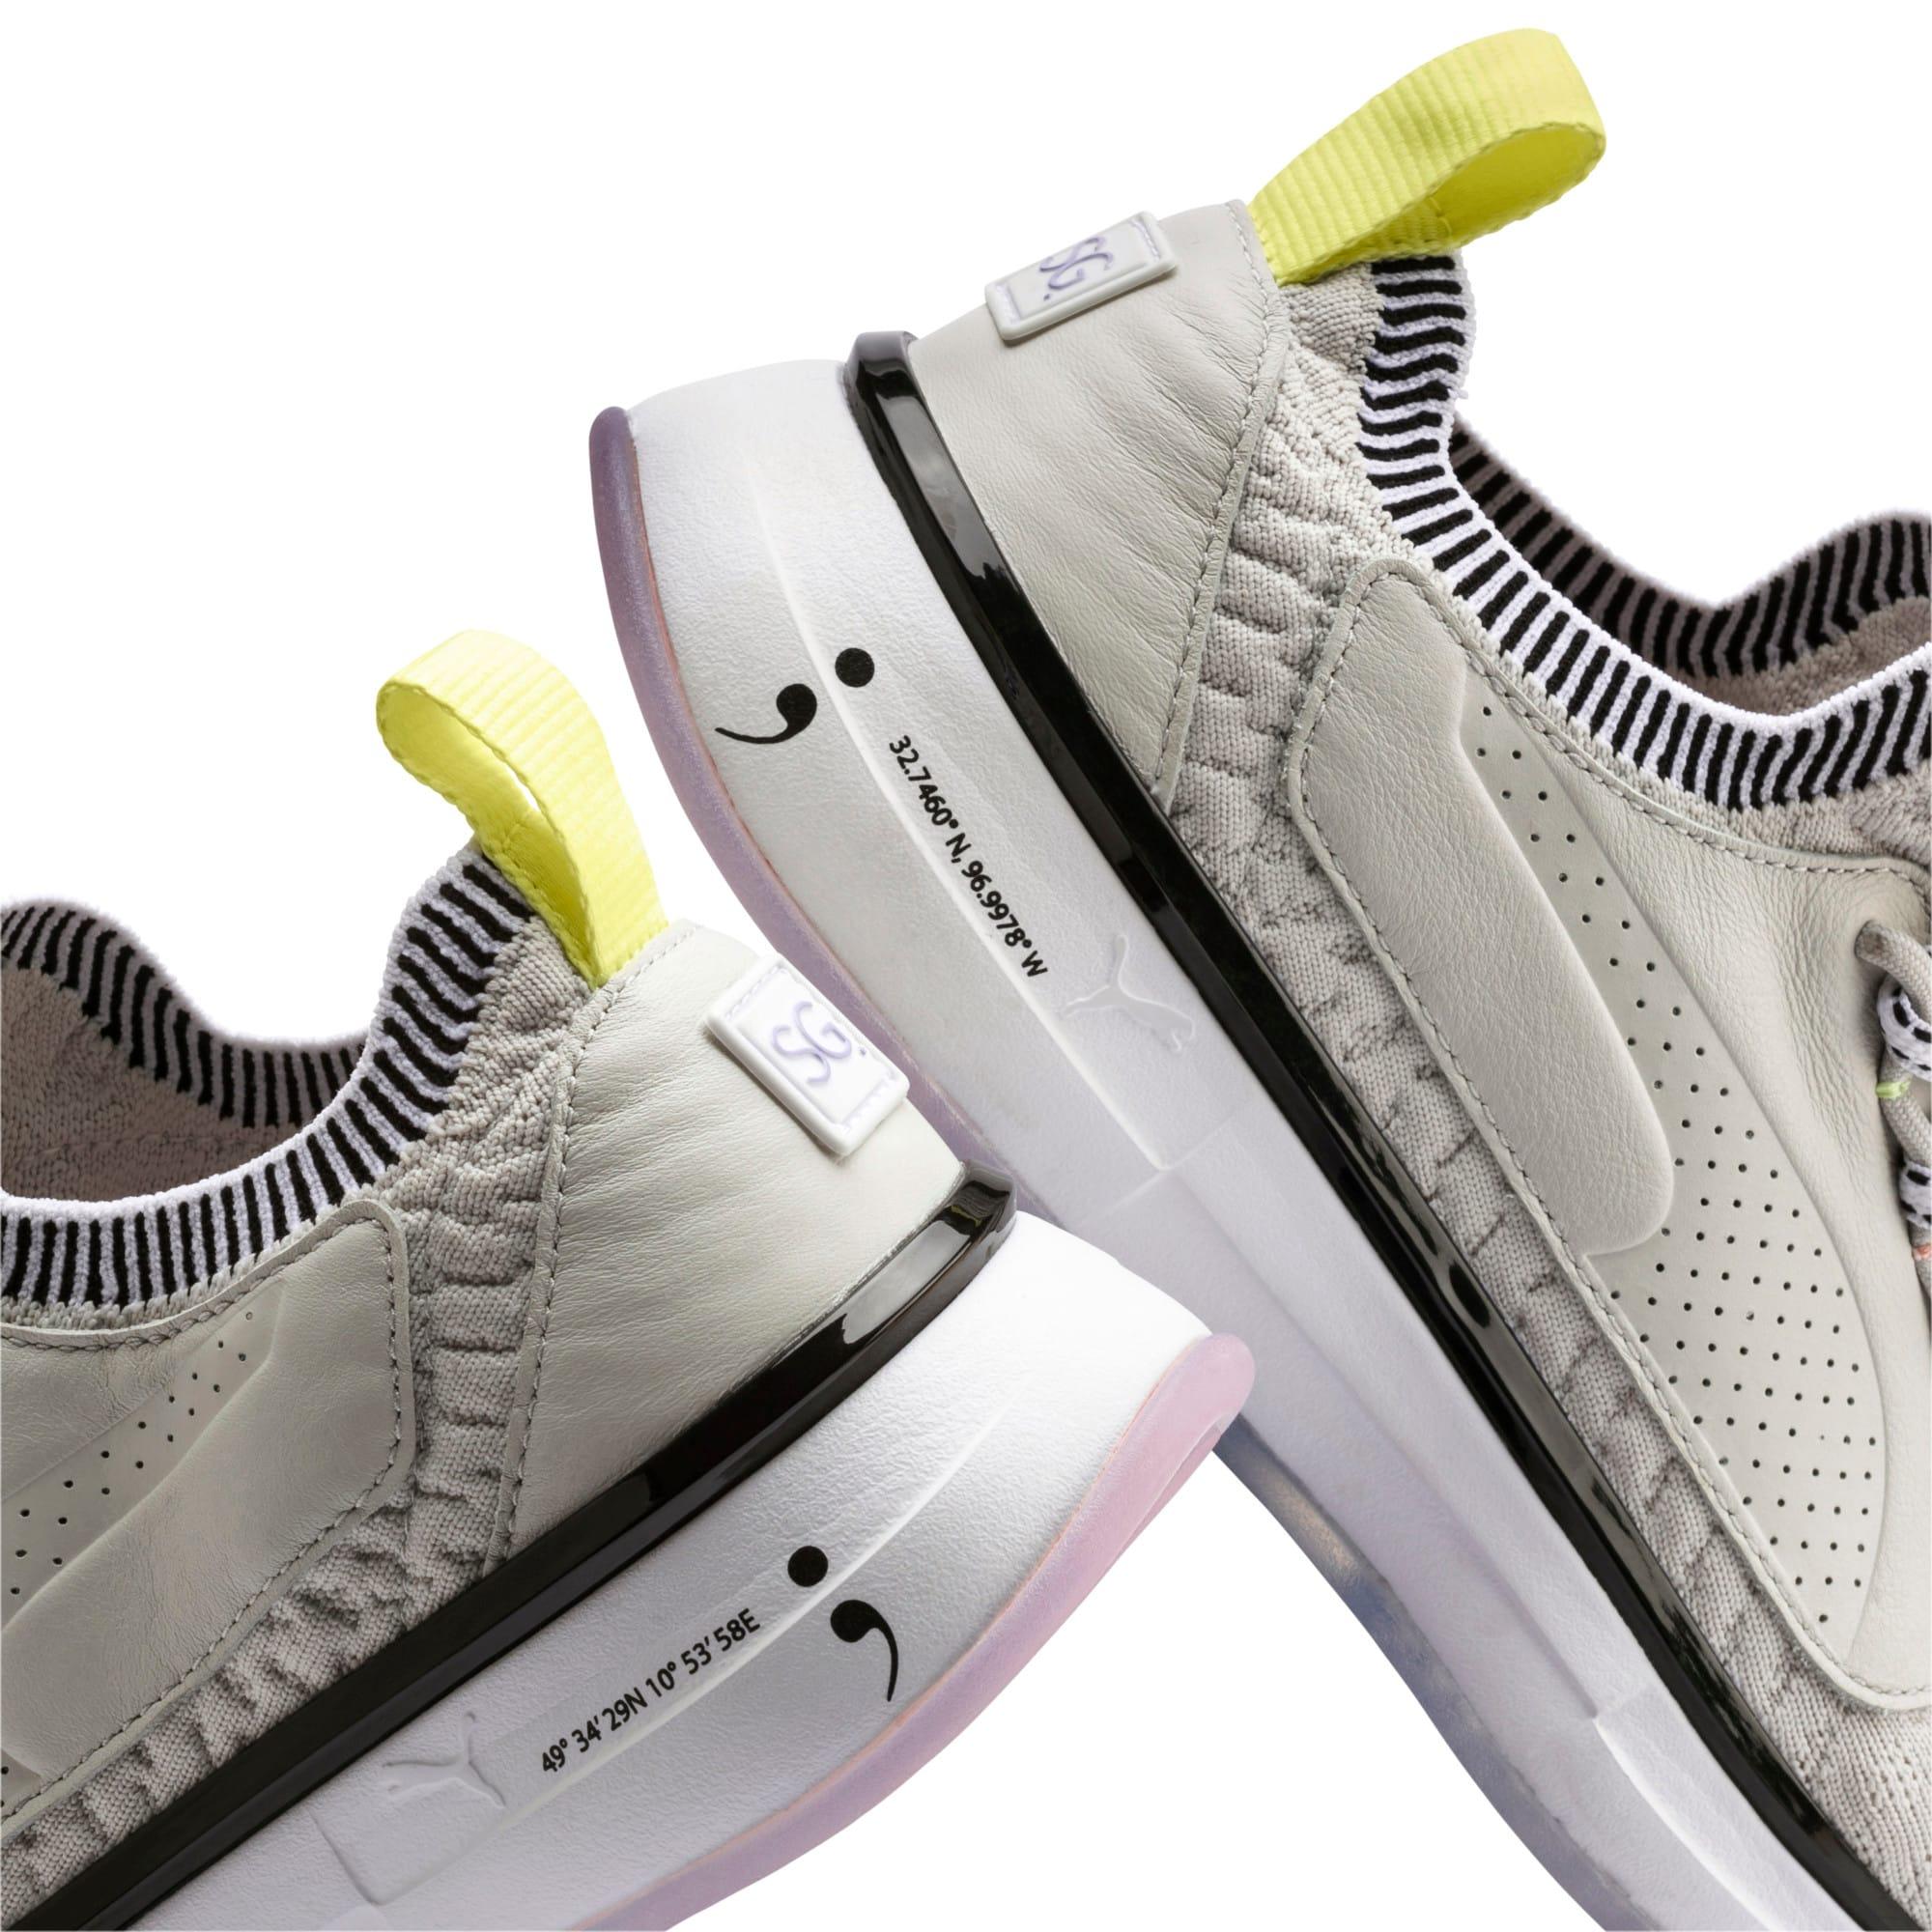 Thumbnail 8 of SG Runner Strength Women's Training Shoes, Glacier Gray-Puma White, medium